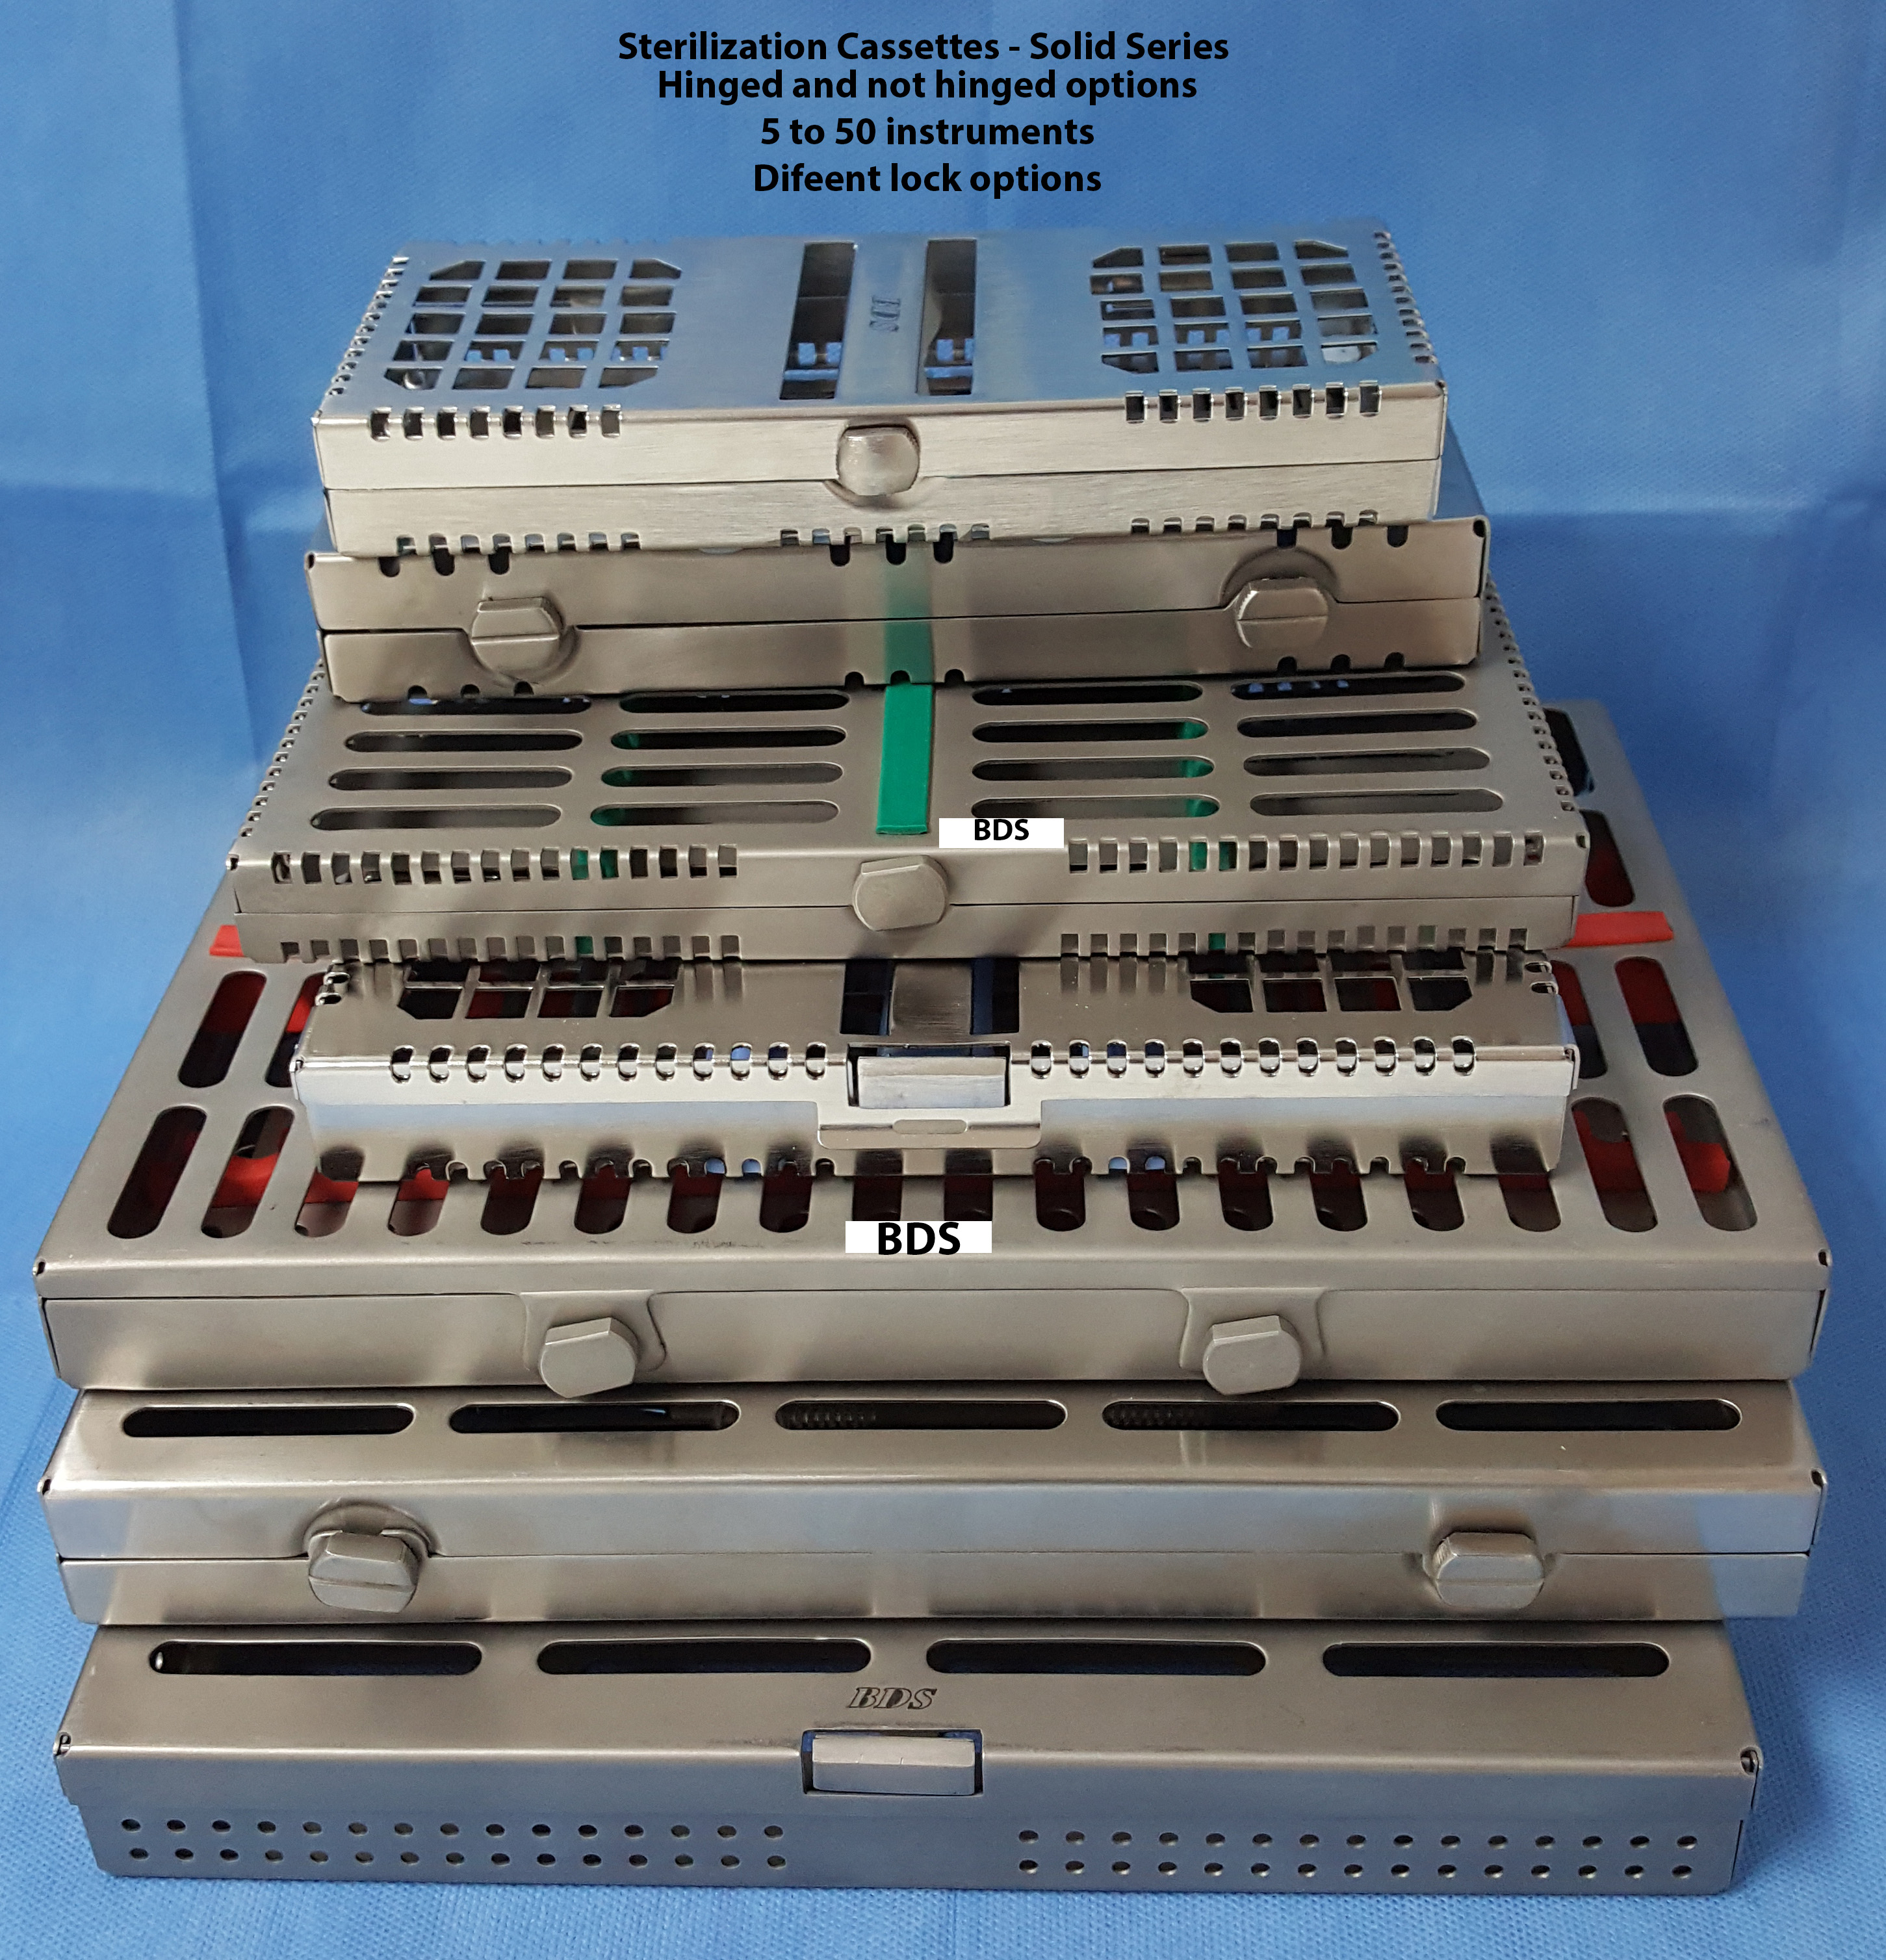 sterilization-cassette-solid-series-bds.jpg